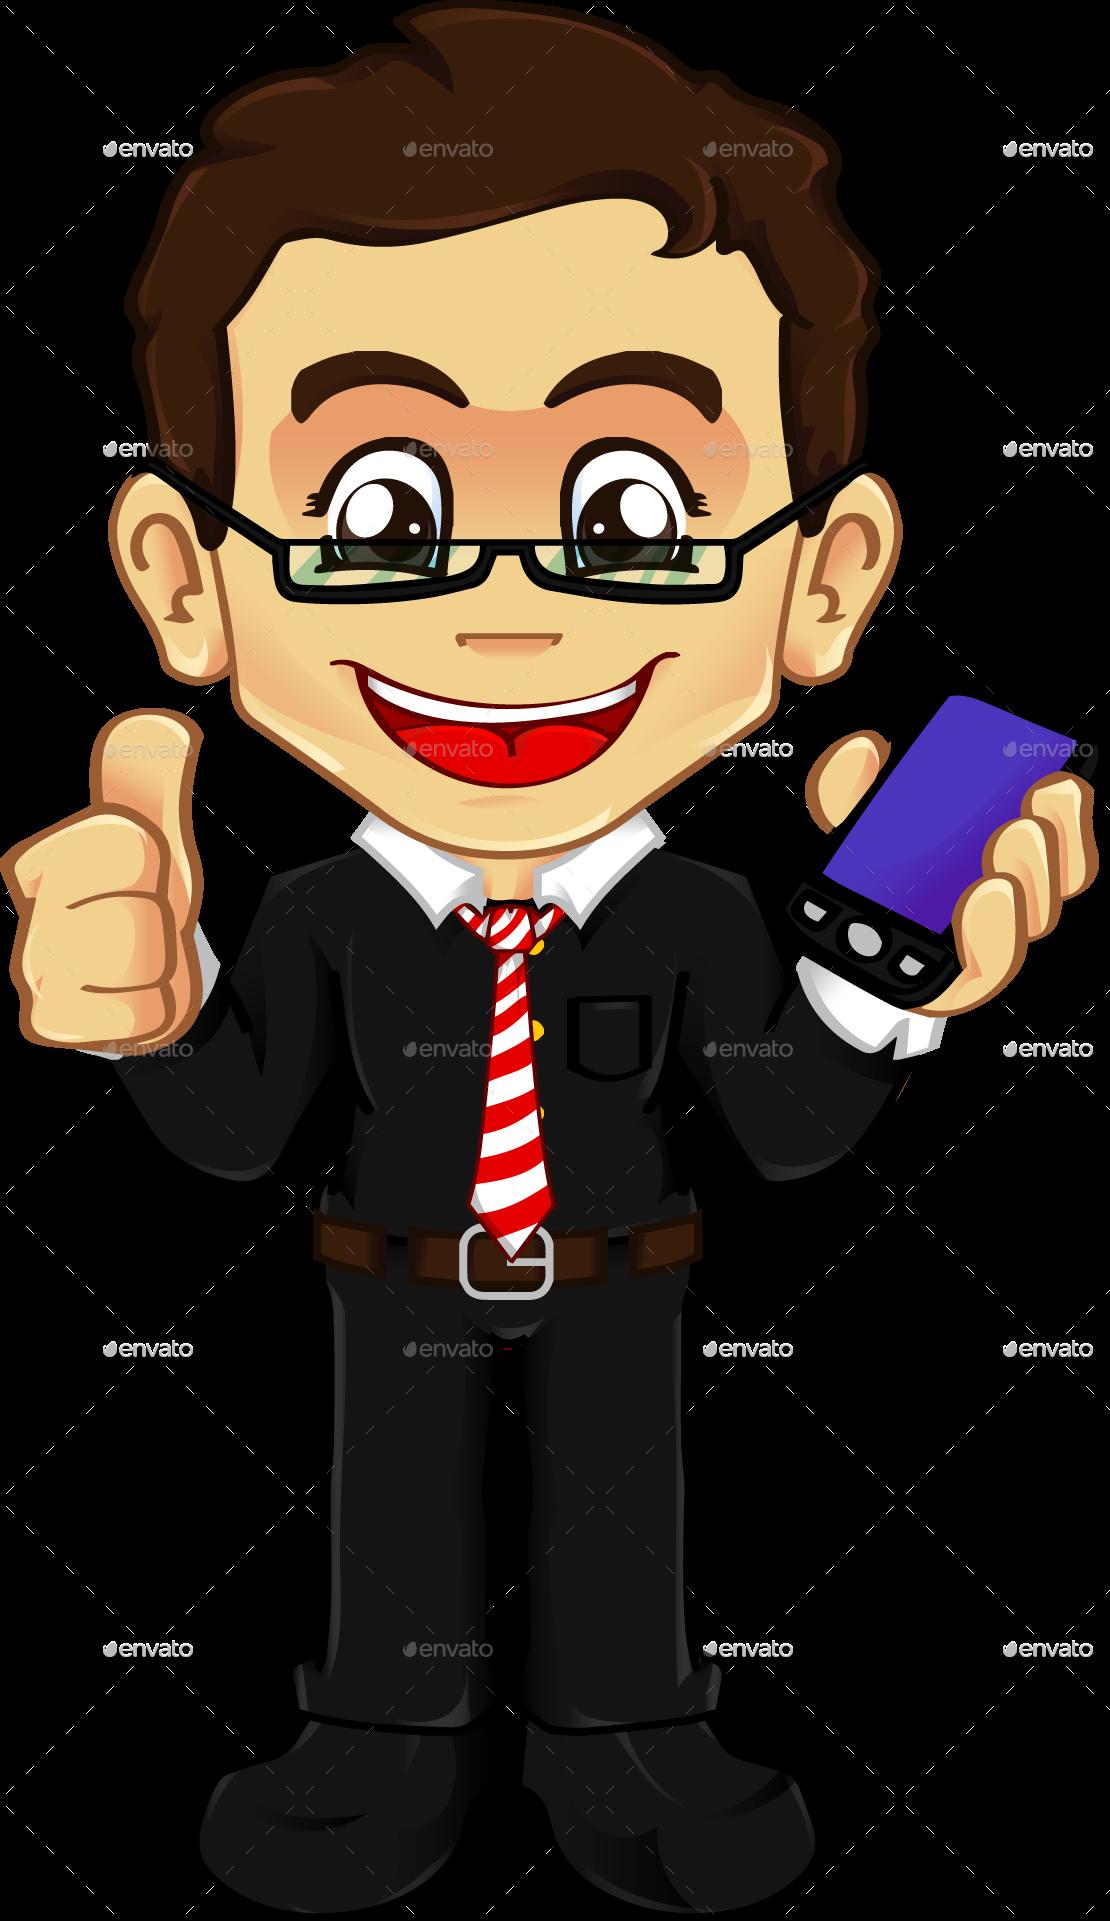 Friendly mascot character kit. Clipart phone boy